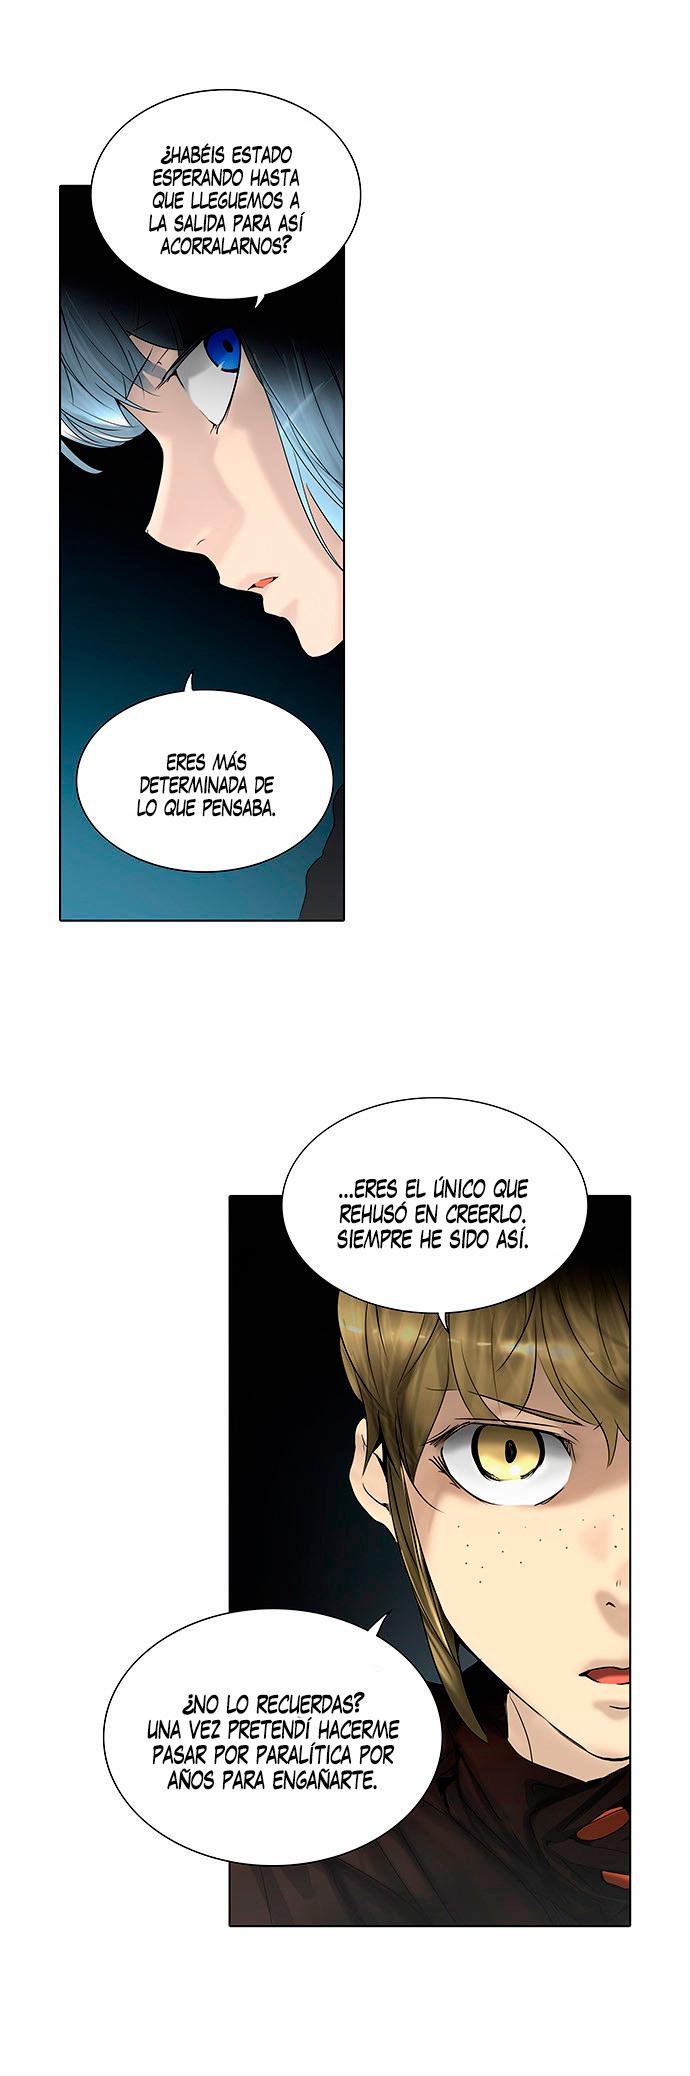 http://c5.ninemanga.com/es_manga/21/149/437997/9ea2a3d45a641fd927eda133e9c1c248.jpg Page 3